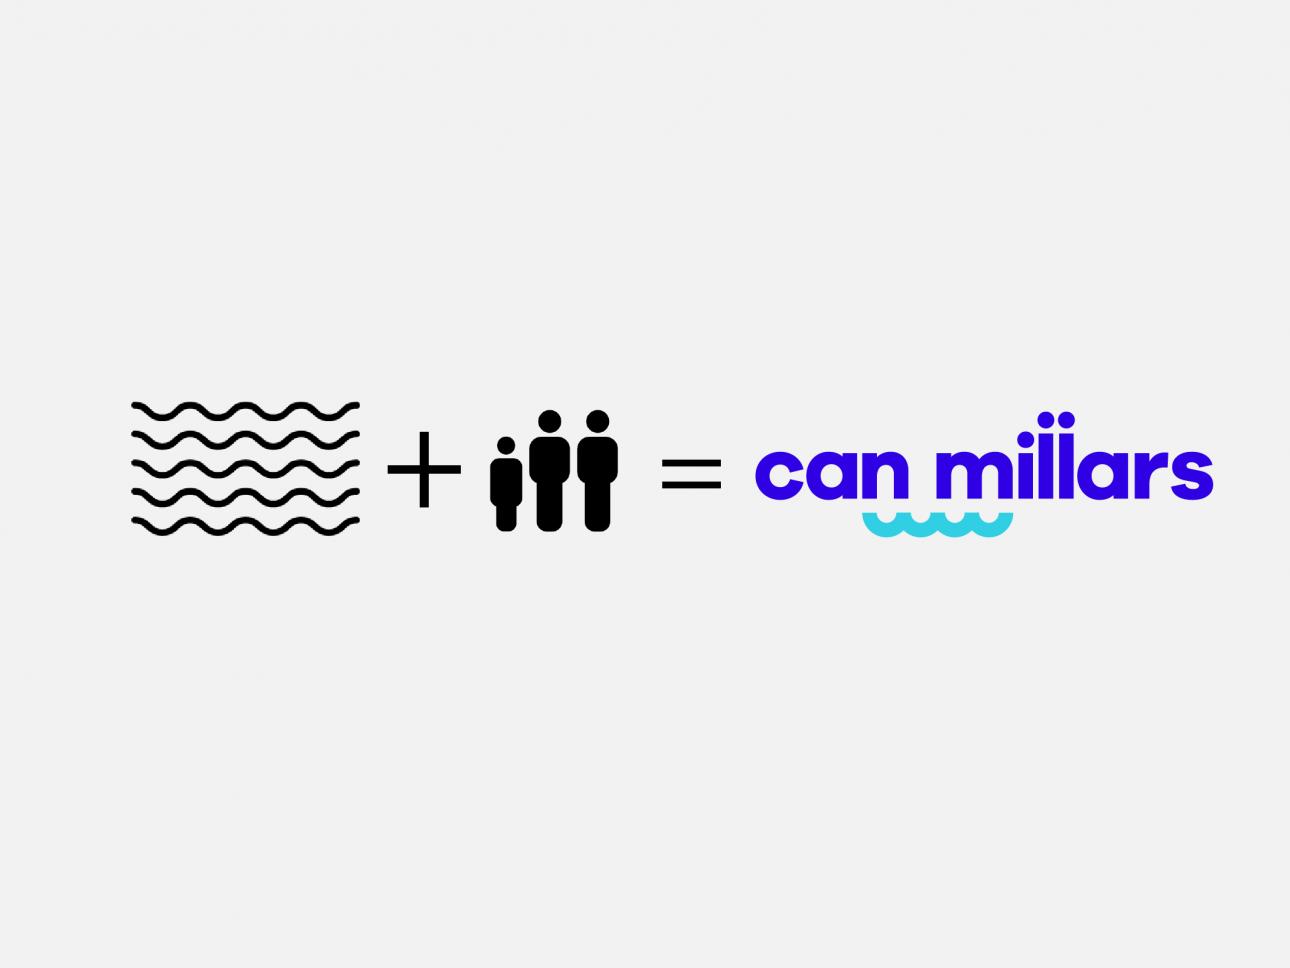 SD_CAN-MILLARS_03